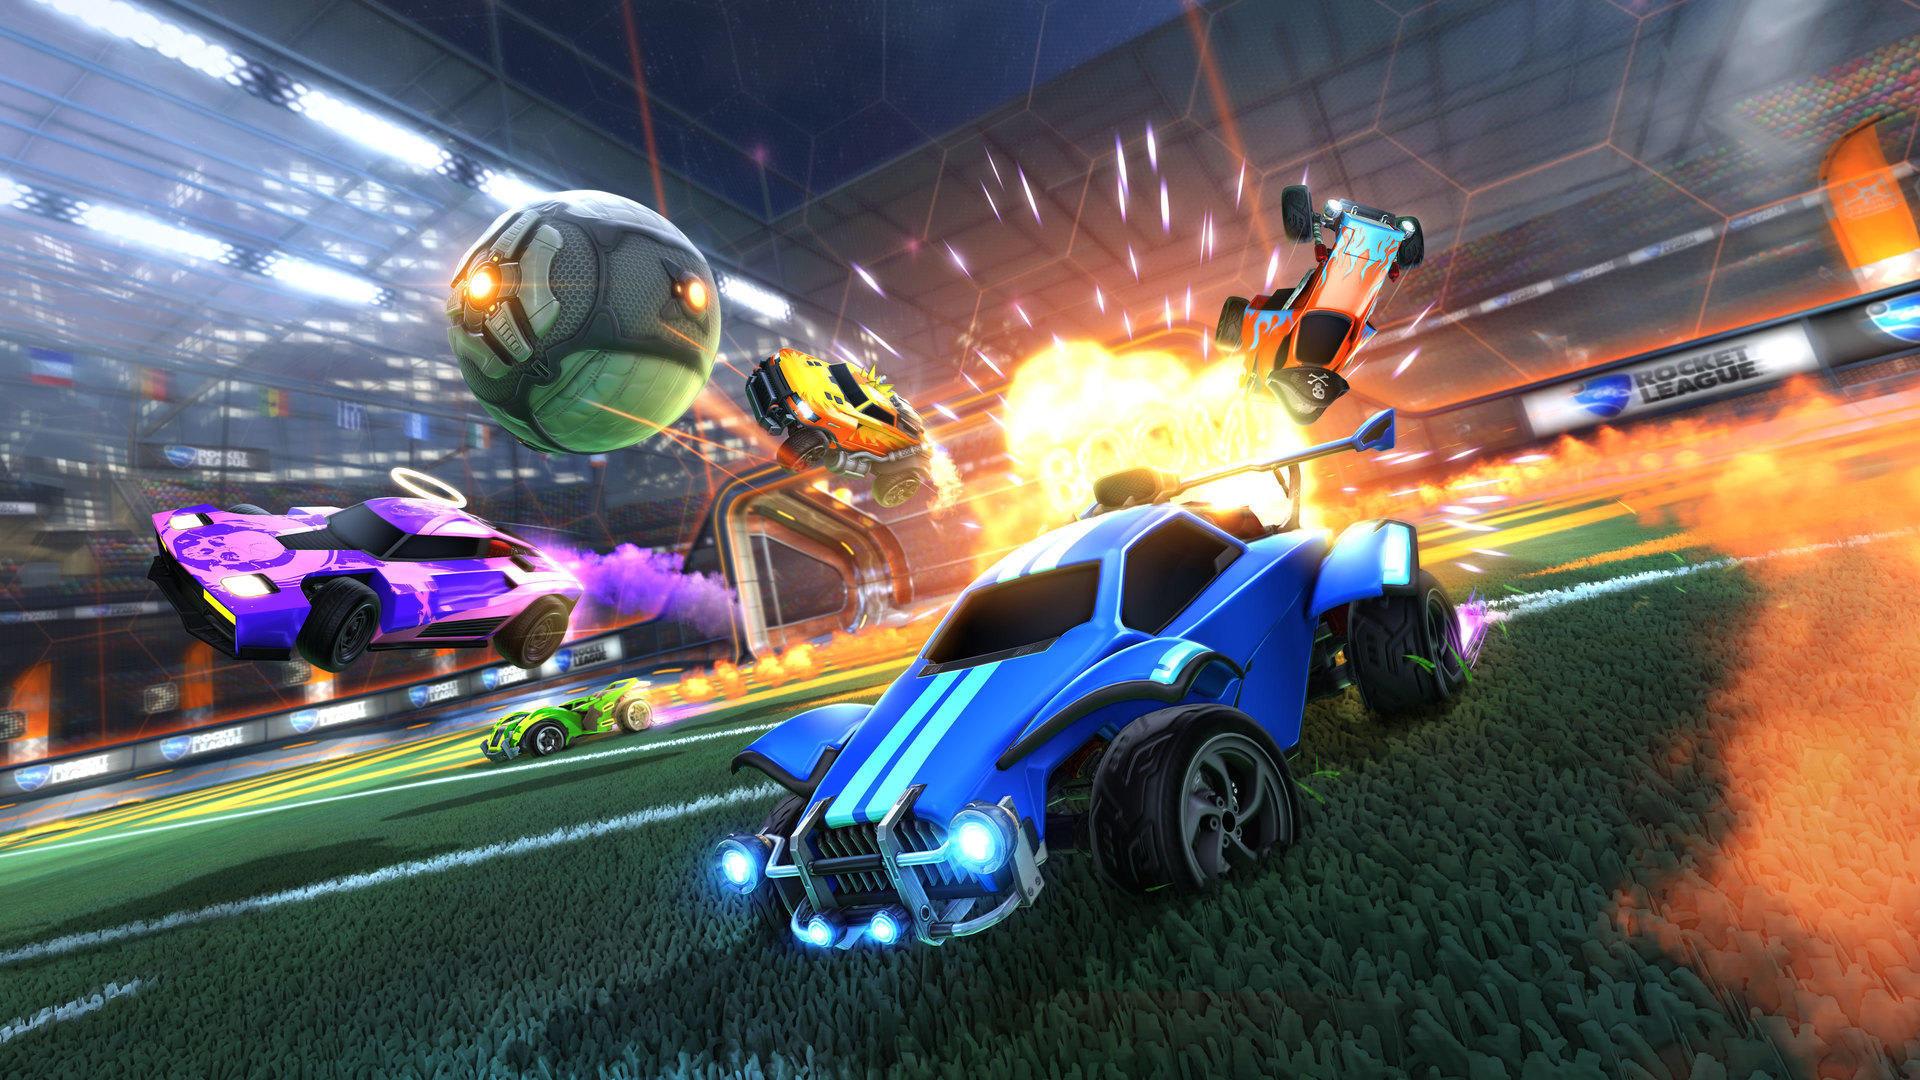 Fortnite Cross Platfprm Friends Best Cross Play Games On Pc Mobile Consoles Top 10